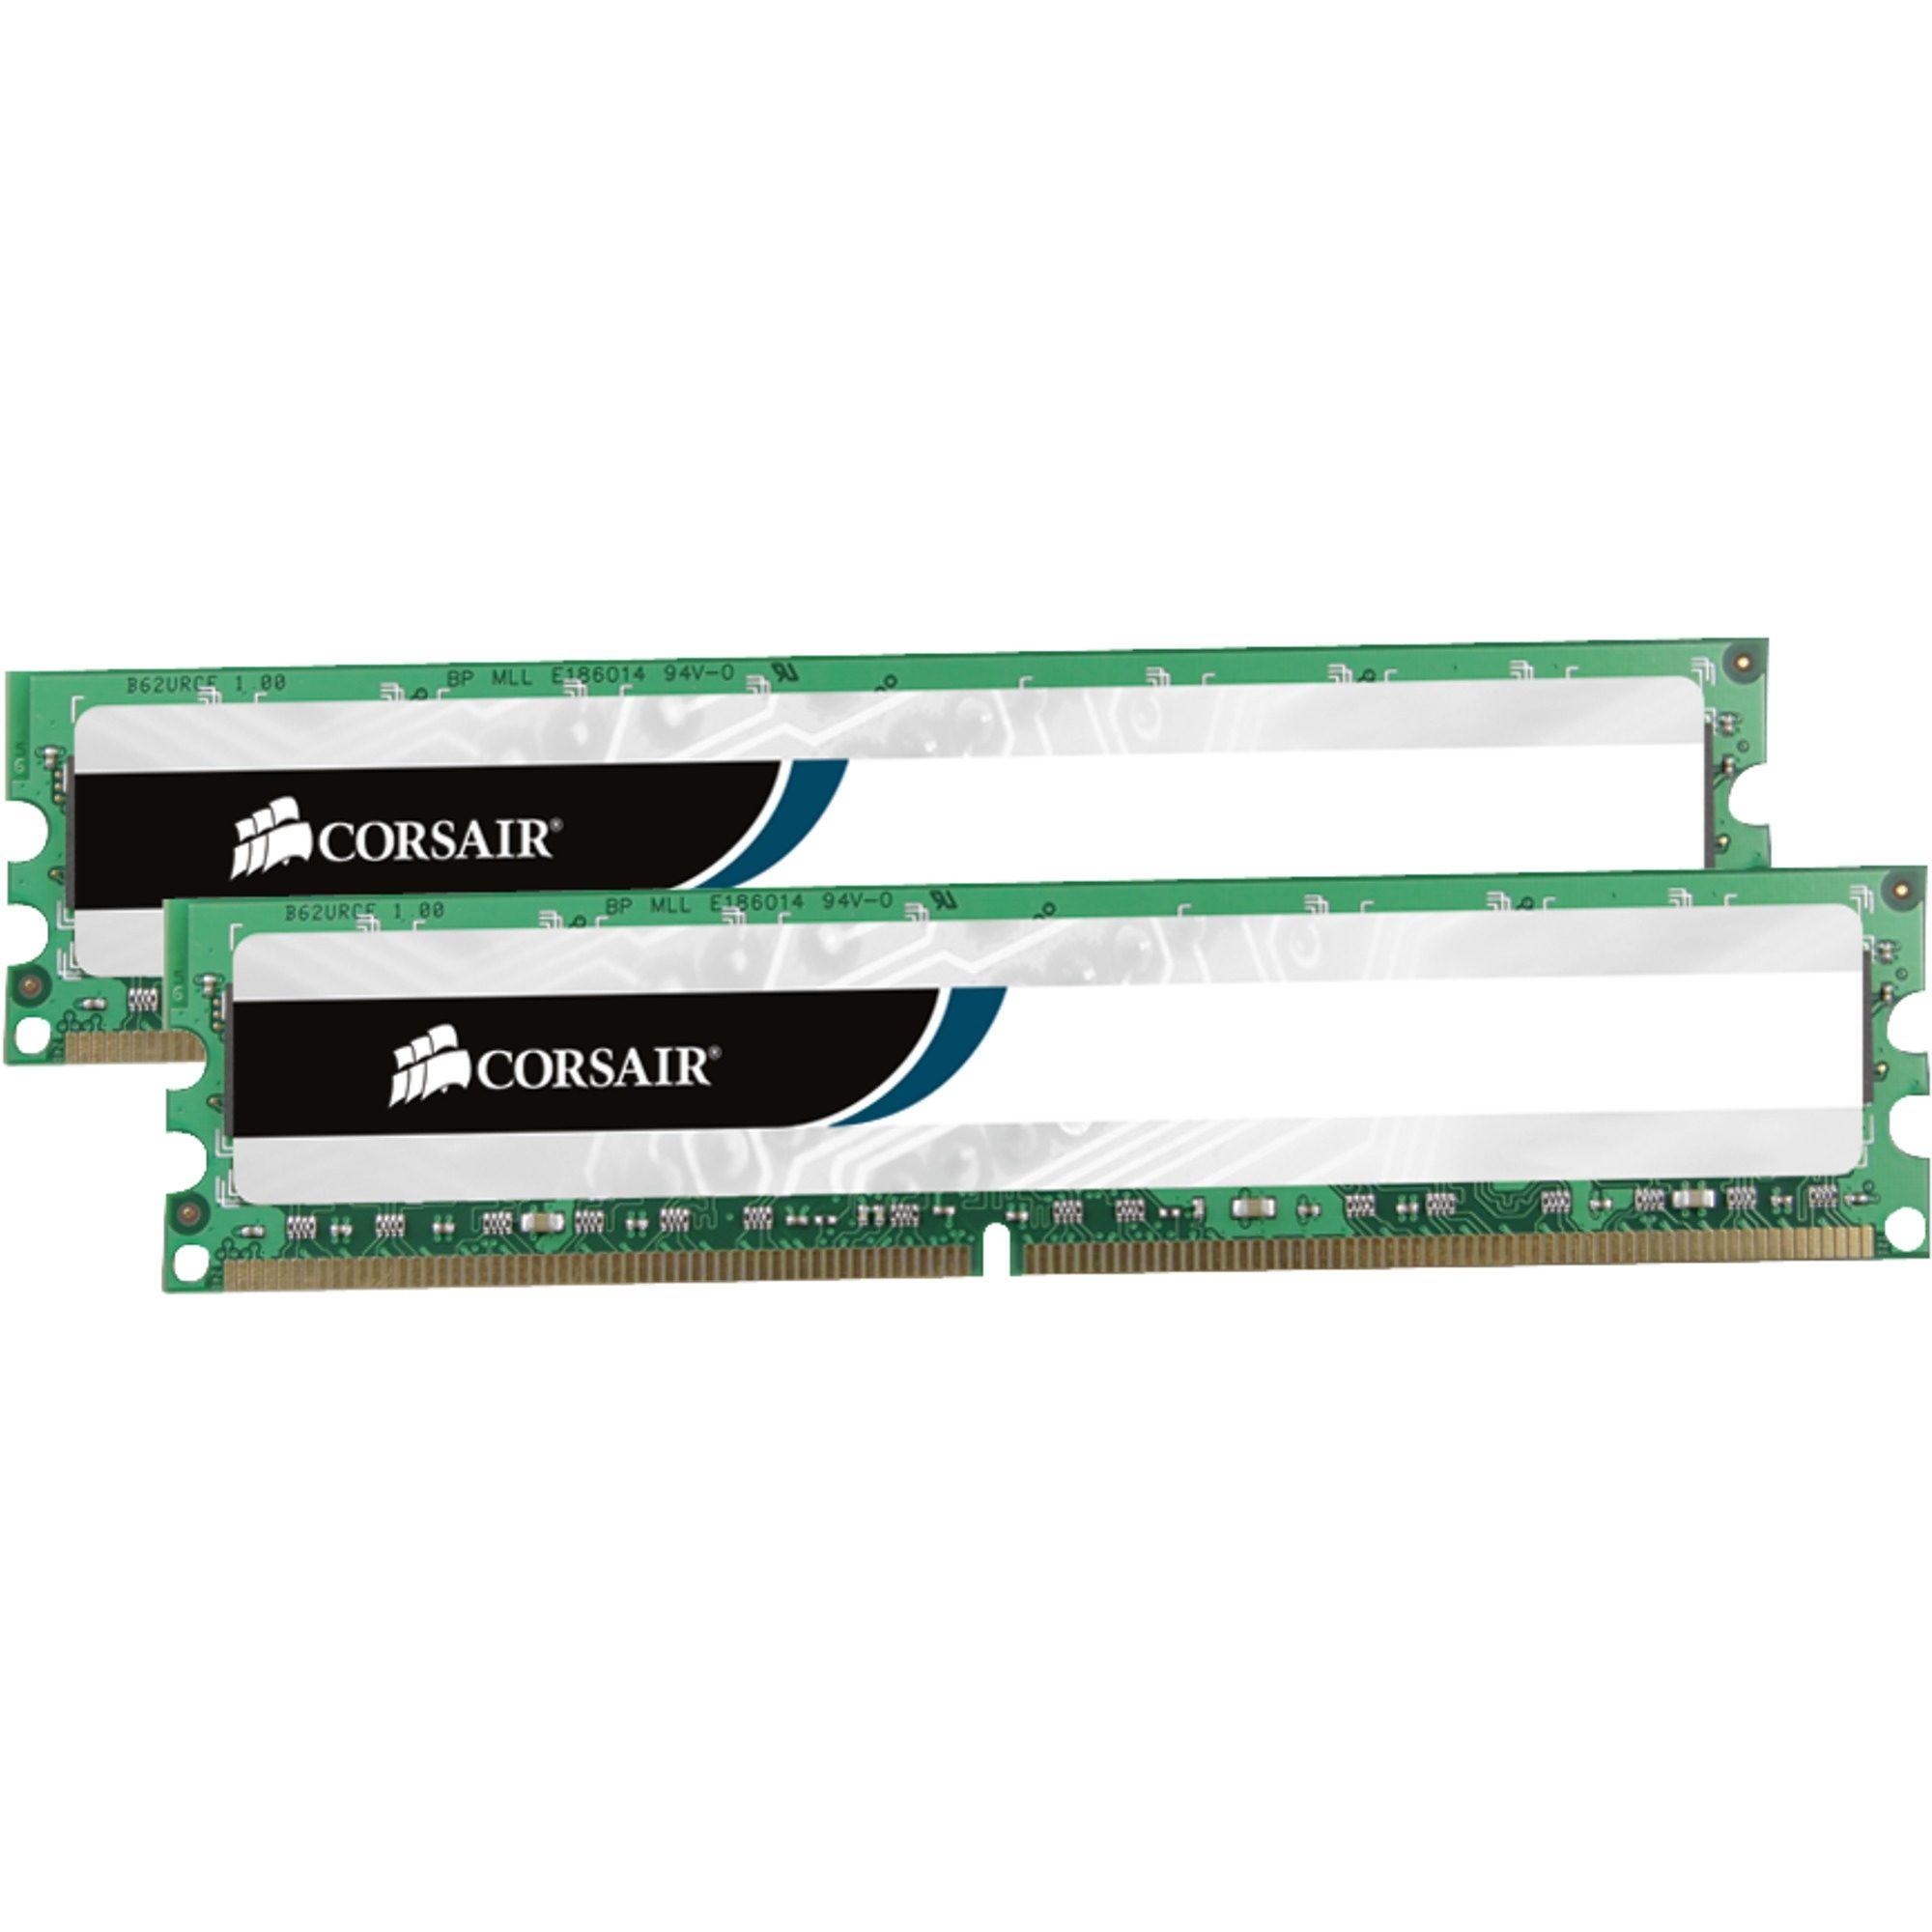 Corsair ValueSelect Arbeitsspeicher »DIMM 8 GB DDR3-1600 Kit«